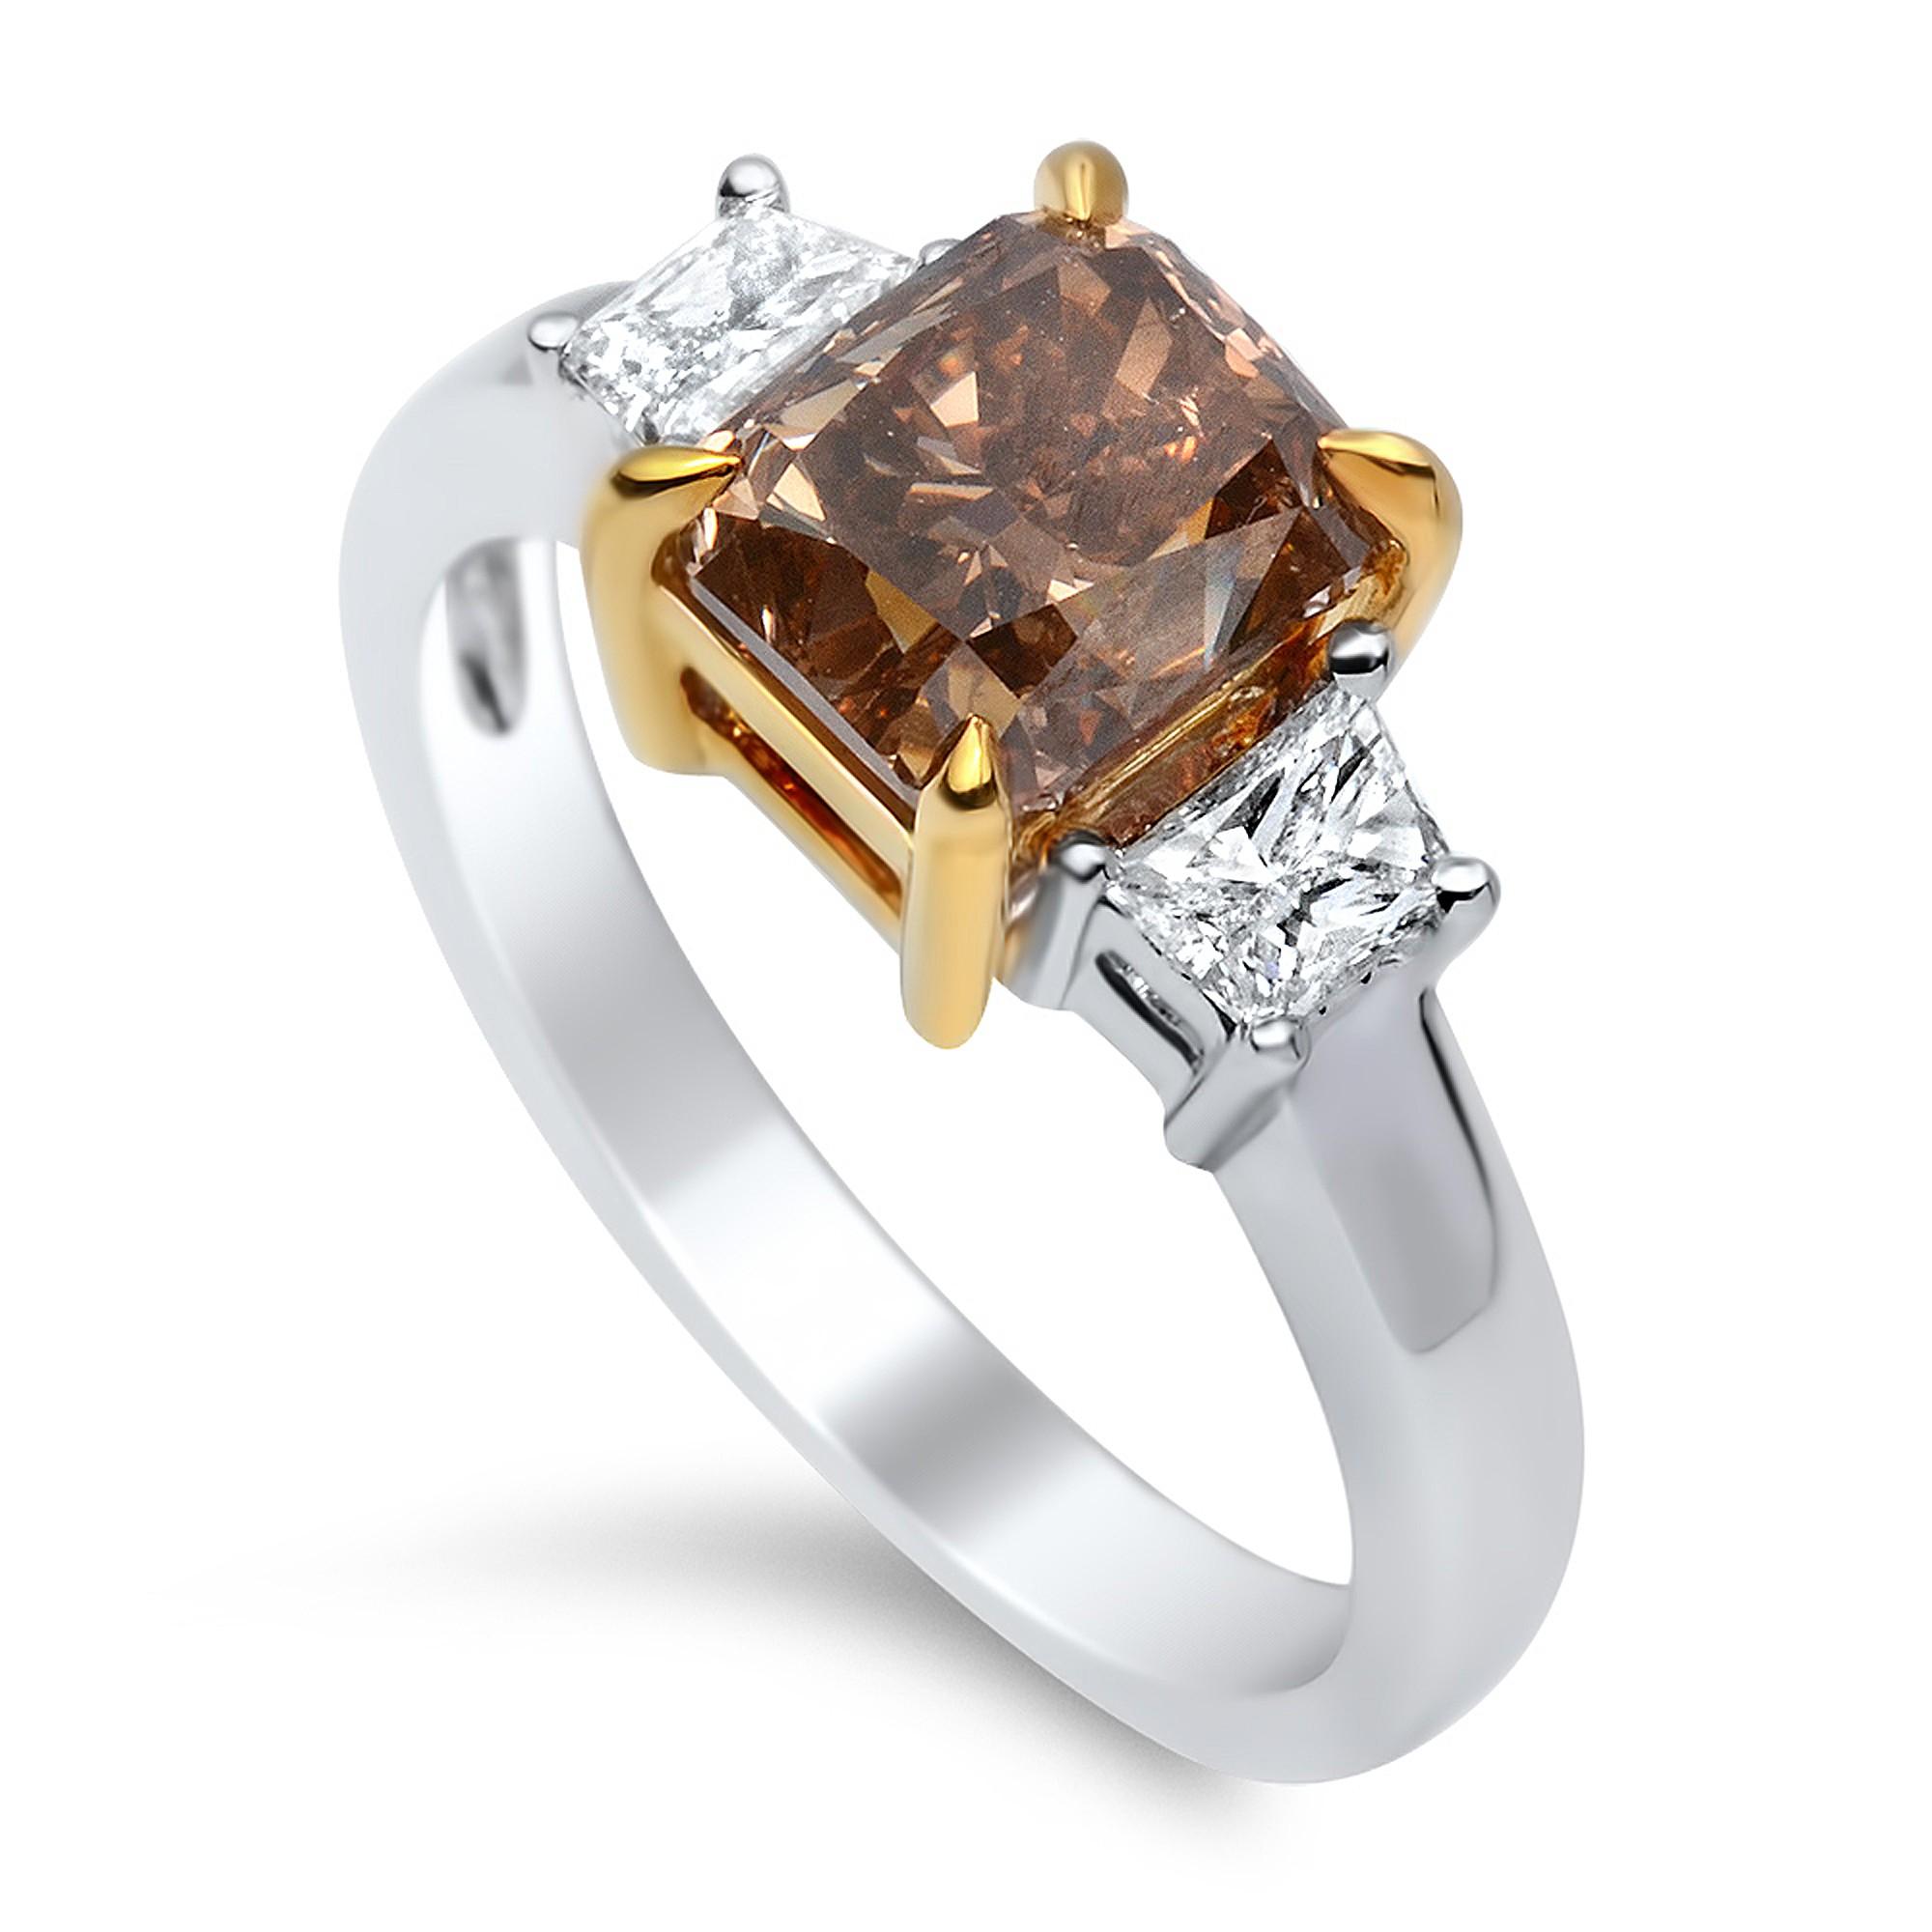 2.72 Carat Fancy Dark Orangy Brown Diamond Ring in 18K Two-Tone Gold (1)